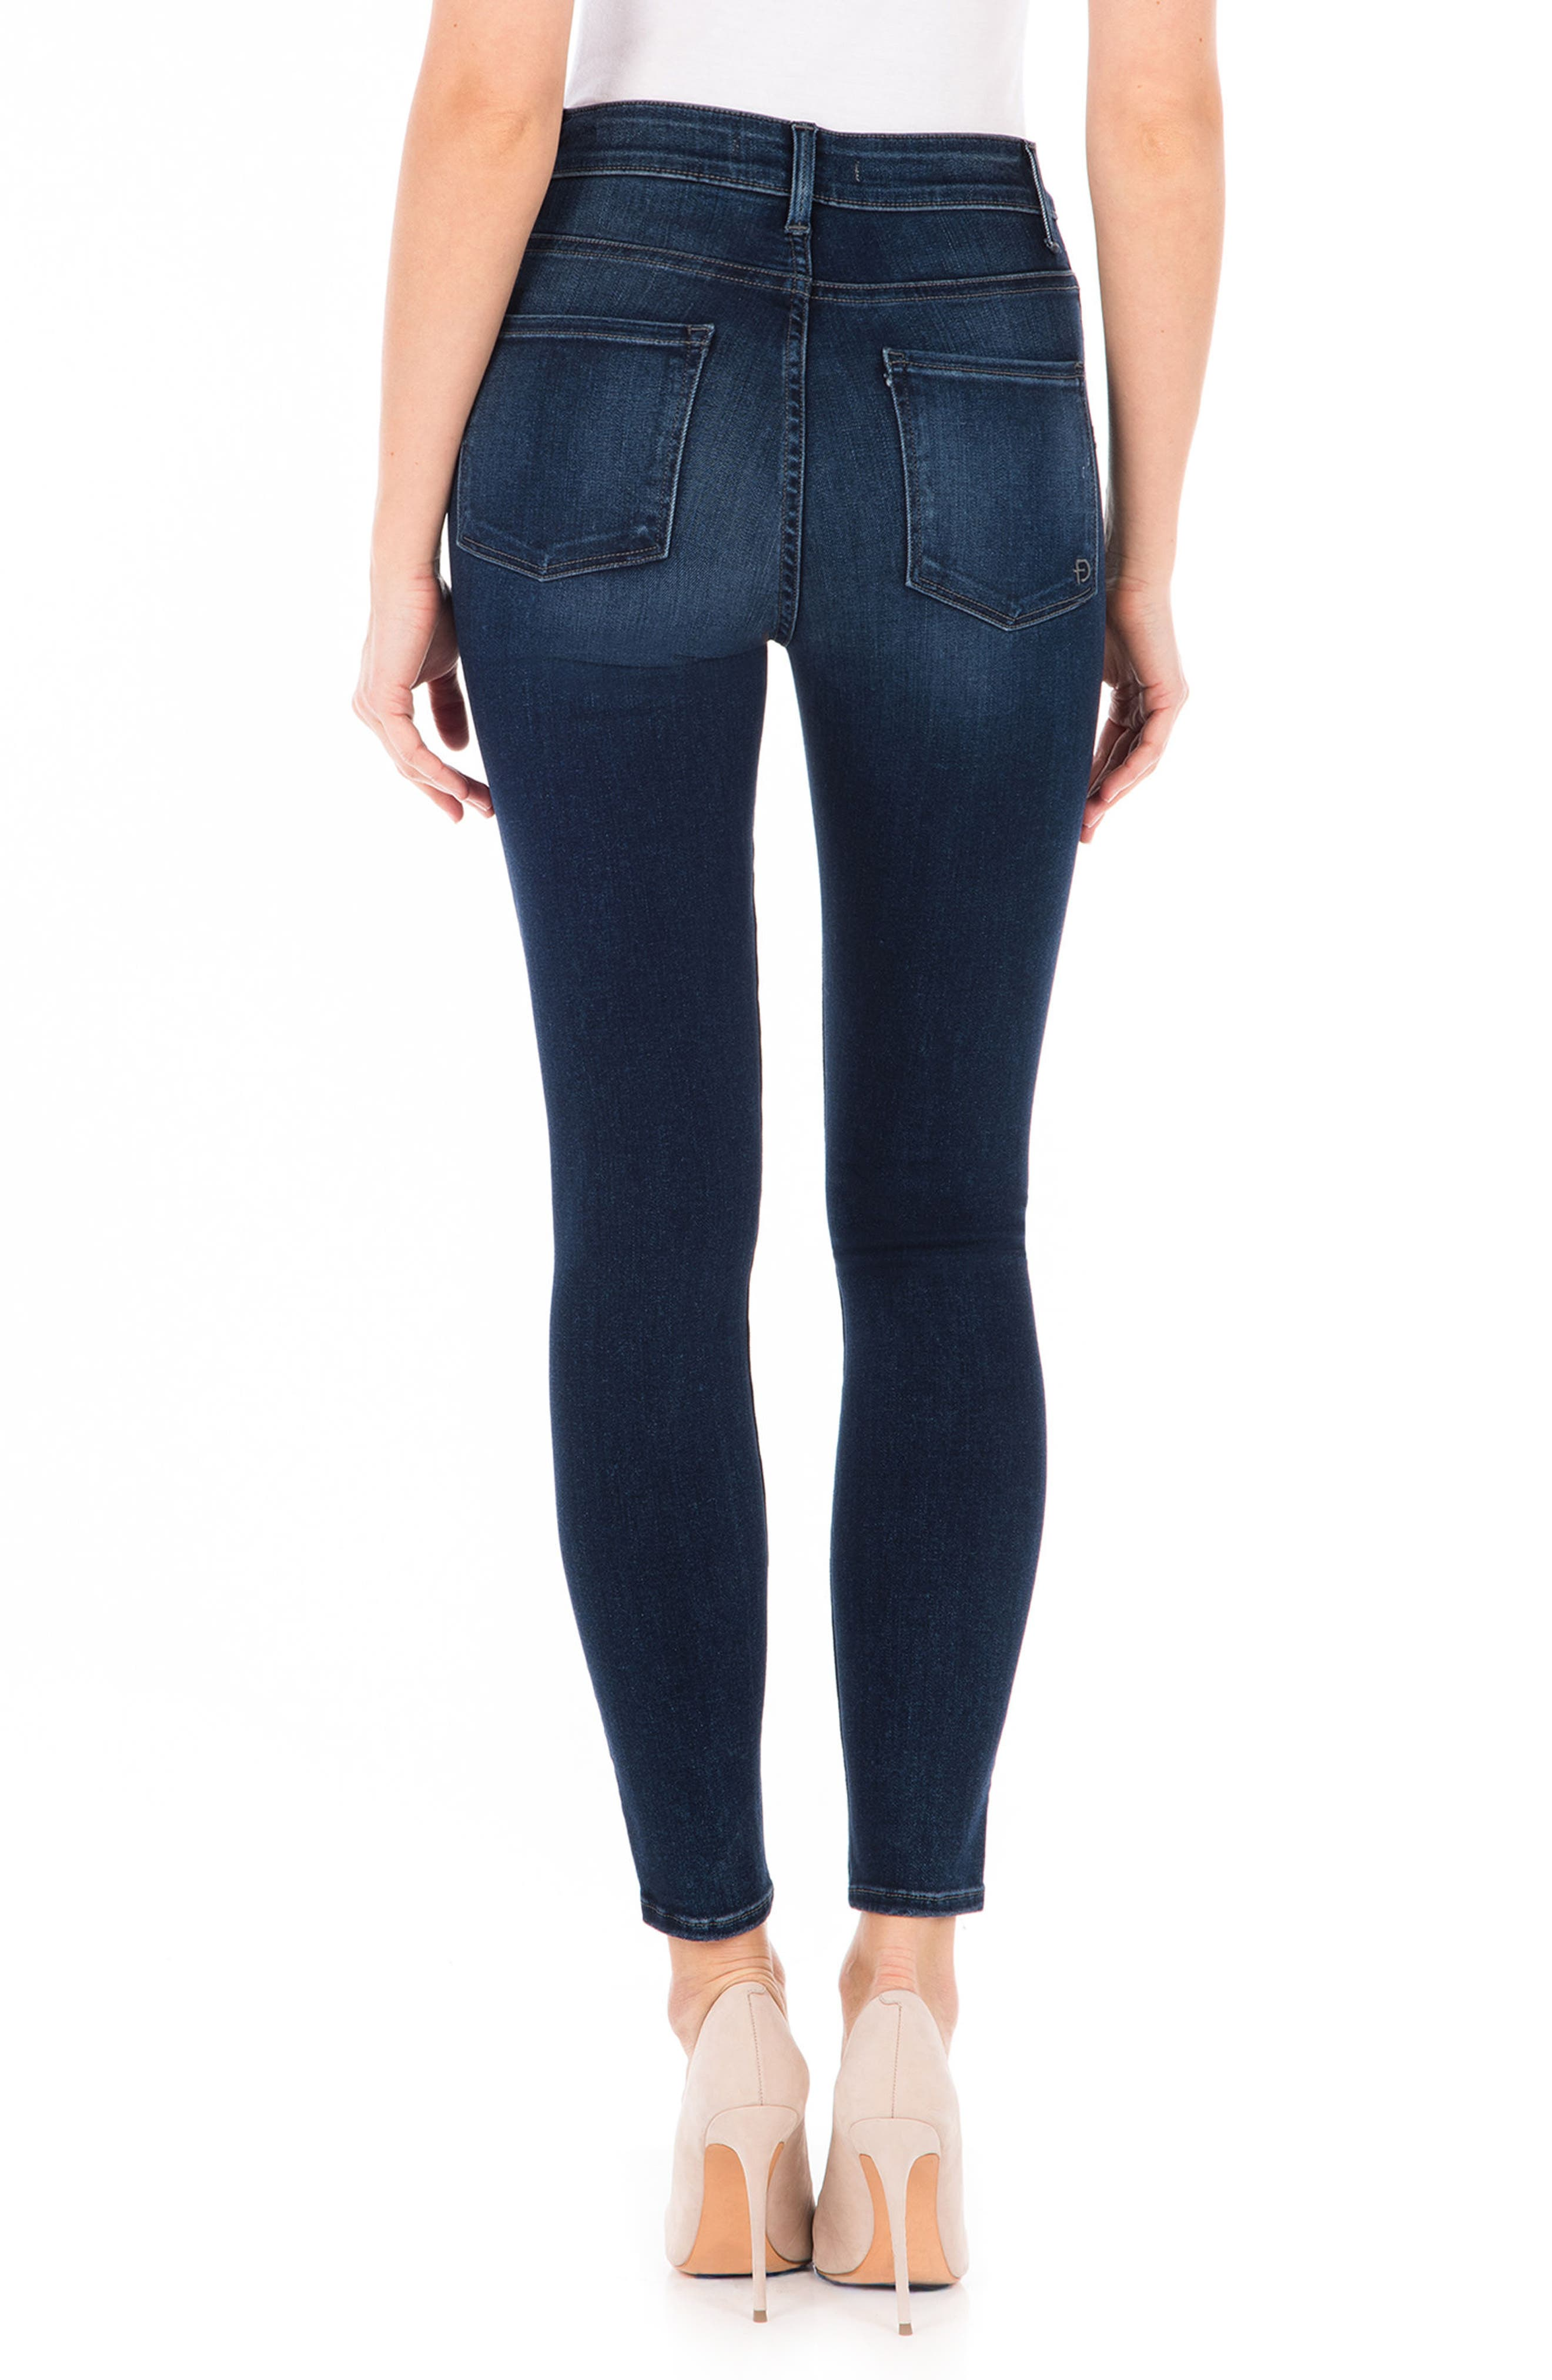 Luna High Waist Skinny Jeans,                             Alternate thumbnail 2, color,                             Blue Suede